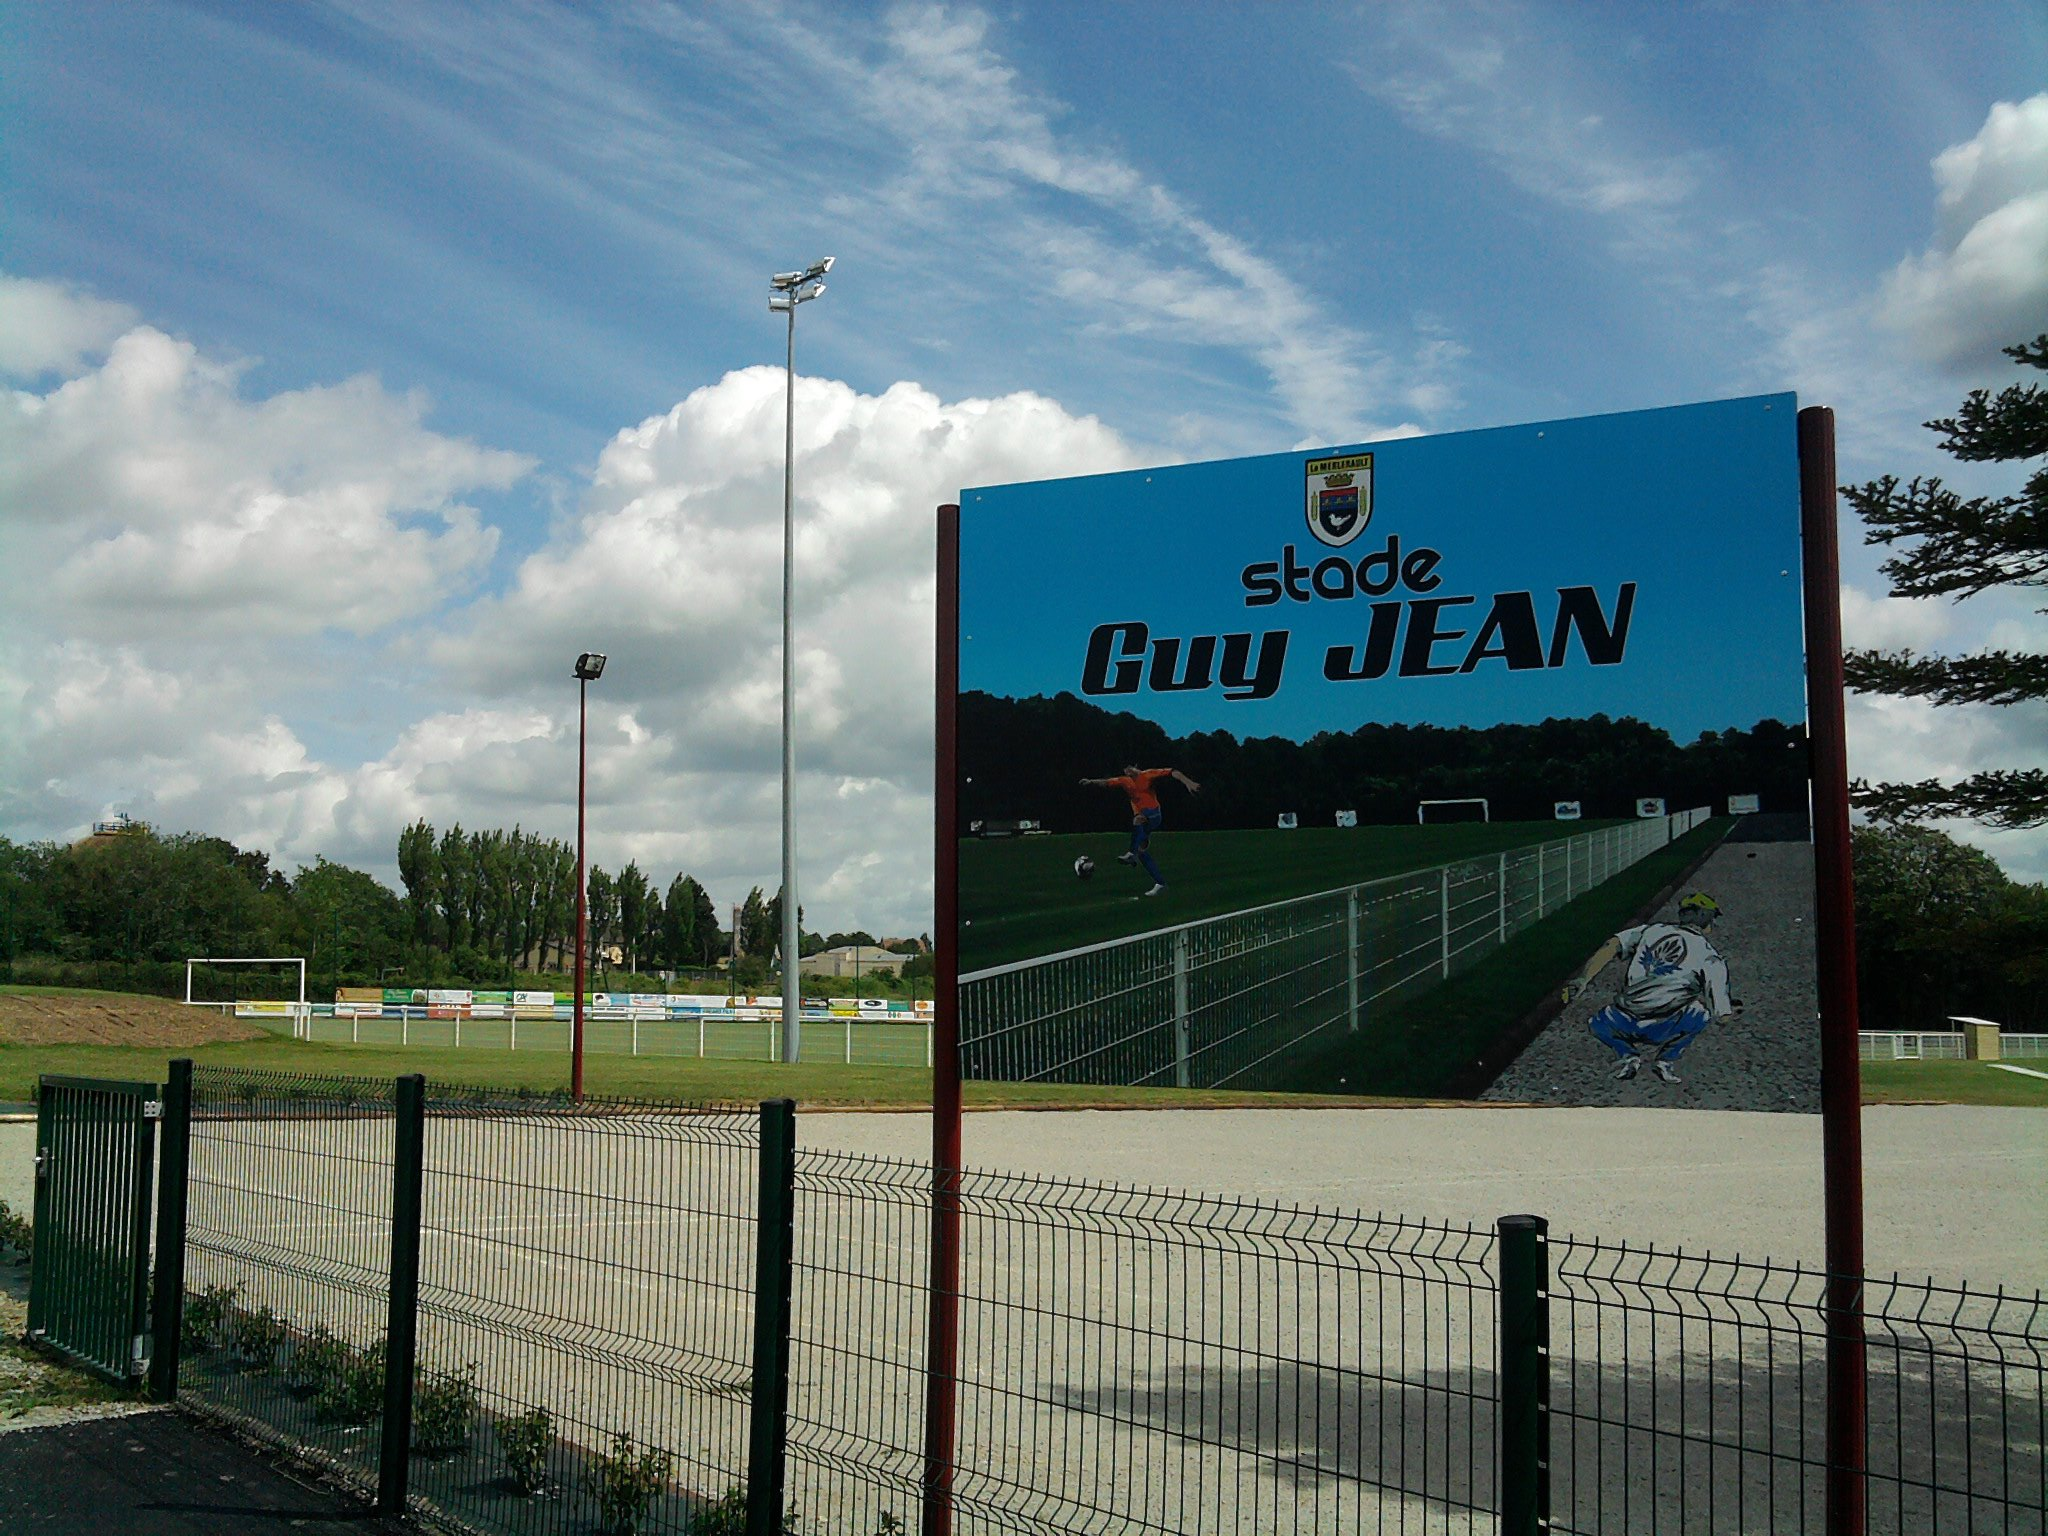 Le complexe sportif Guy JEAN